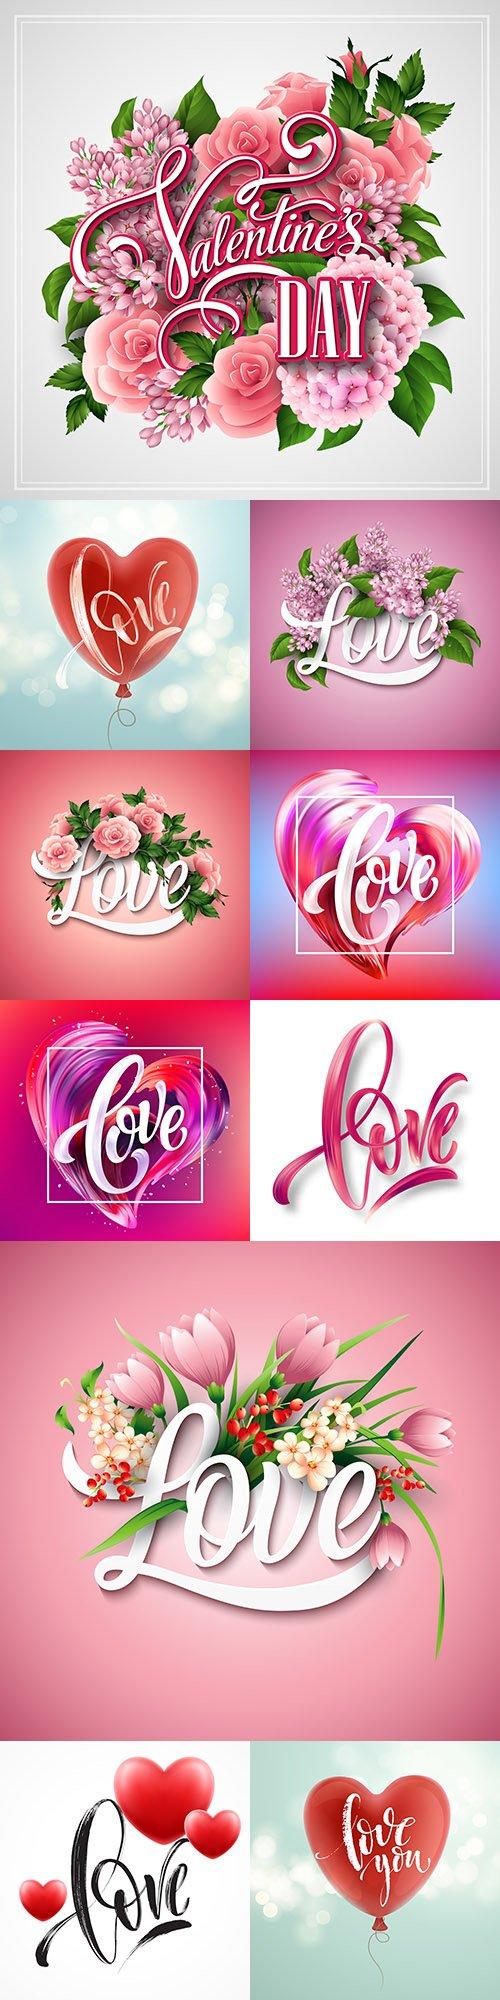 Happy Valentine's Day romantic decorative illustrations 30